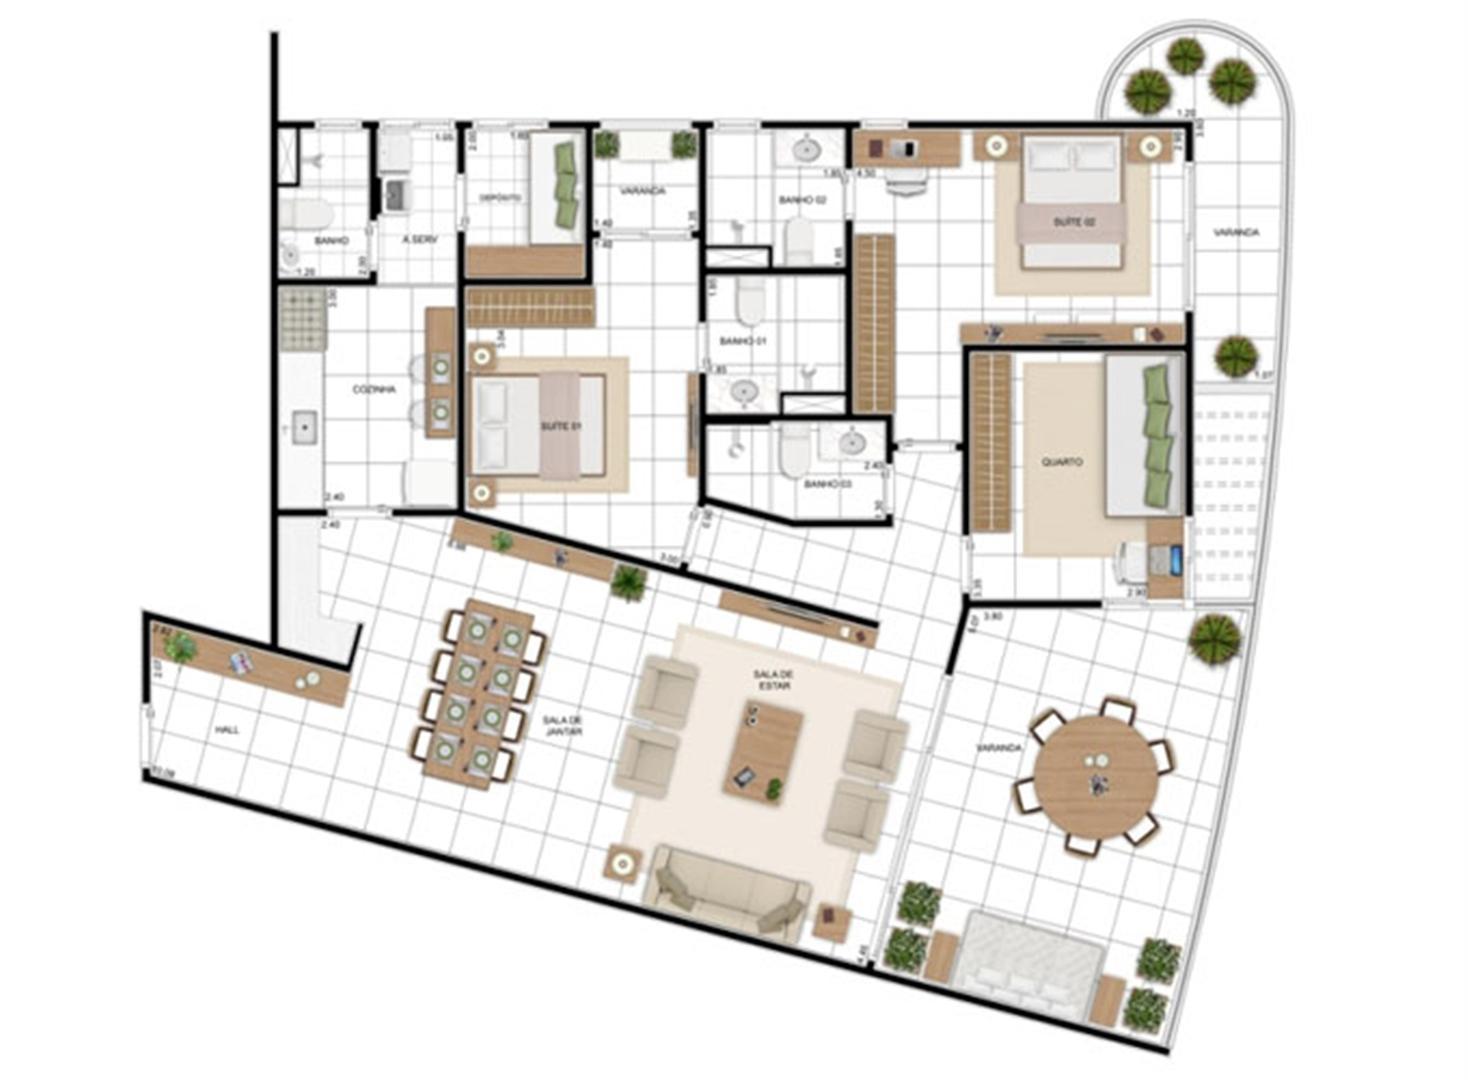 PLANTA - APTO TIPO E - 157 m²  | In Mare Bali – Apartamento no  Distrito Litoral de Cotovelo - Parnamirim - Rio Grande do Norte